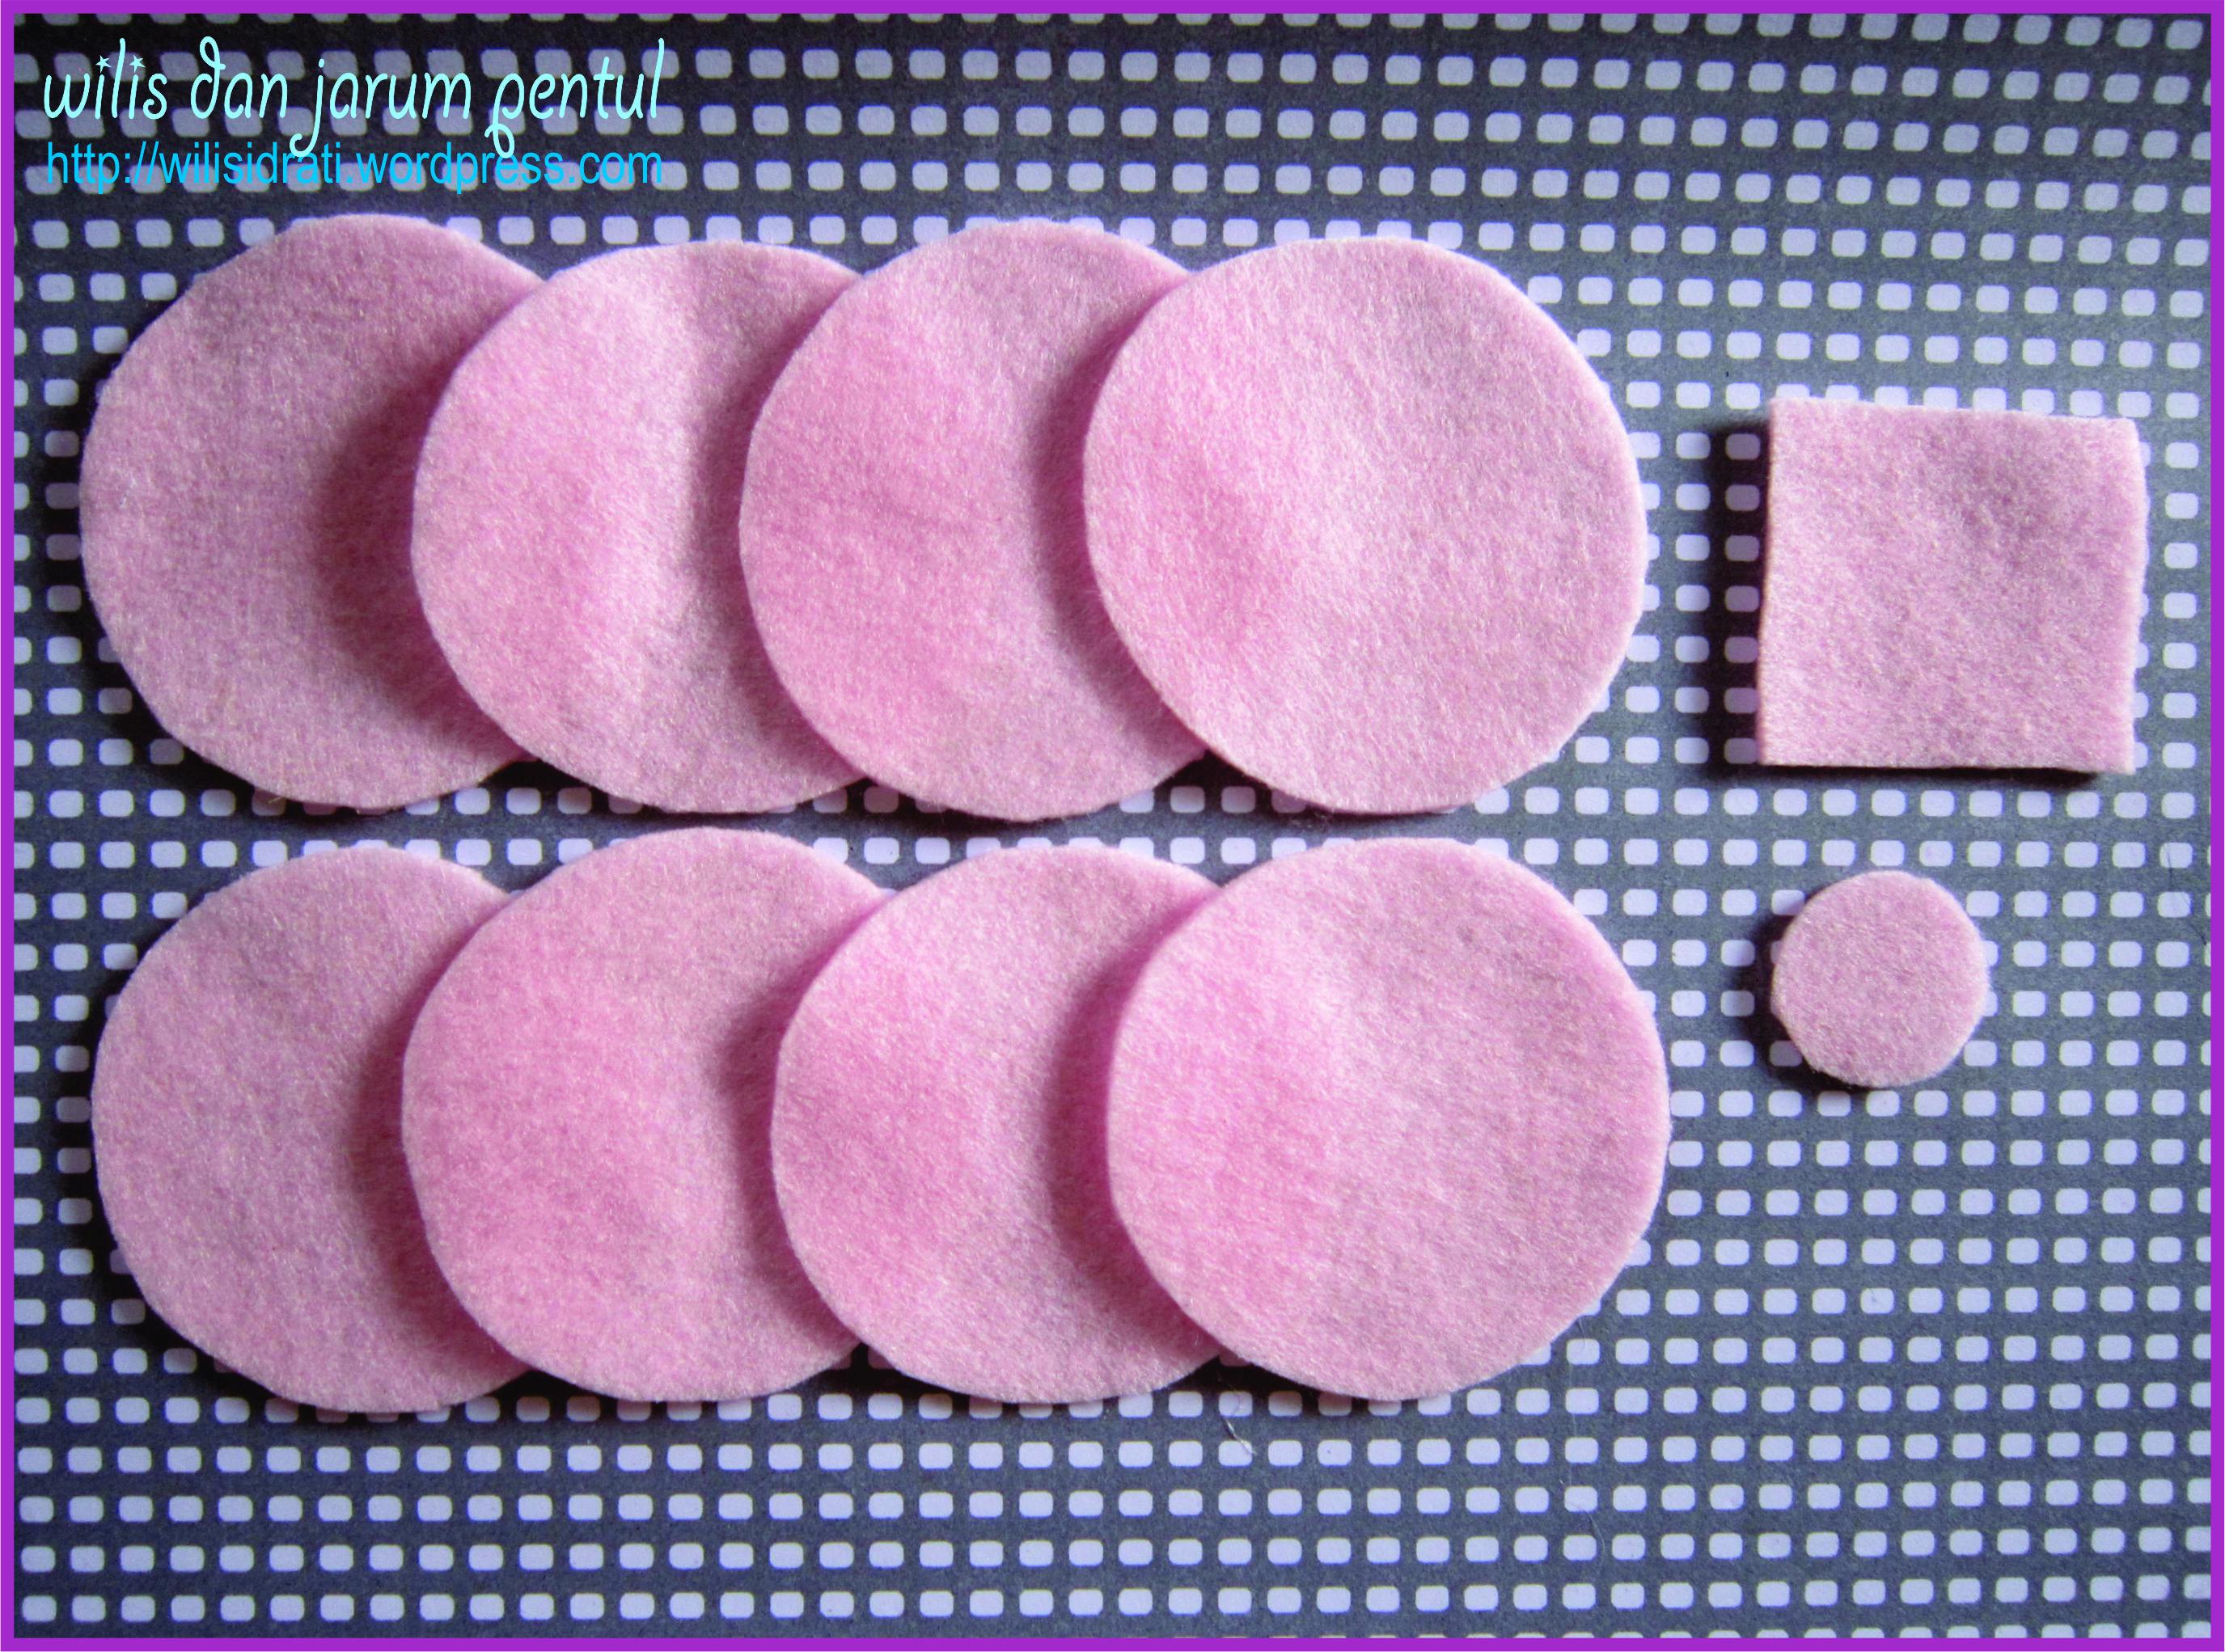 siapkan guntingan-guntingan flanel : 8 lbr bentuk lingkaran diameter 6